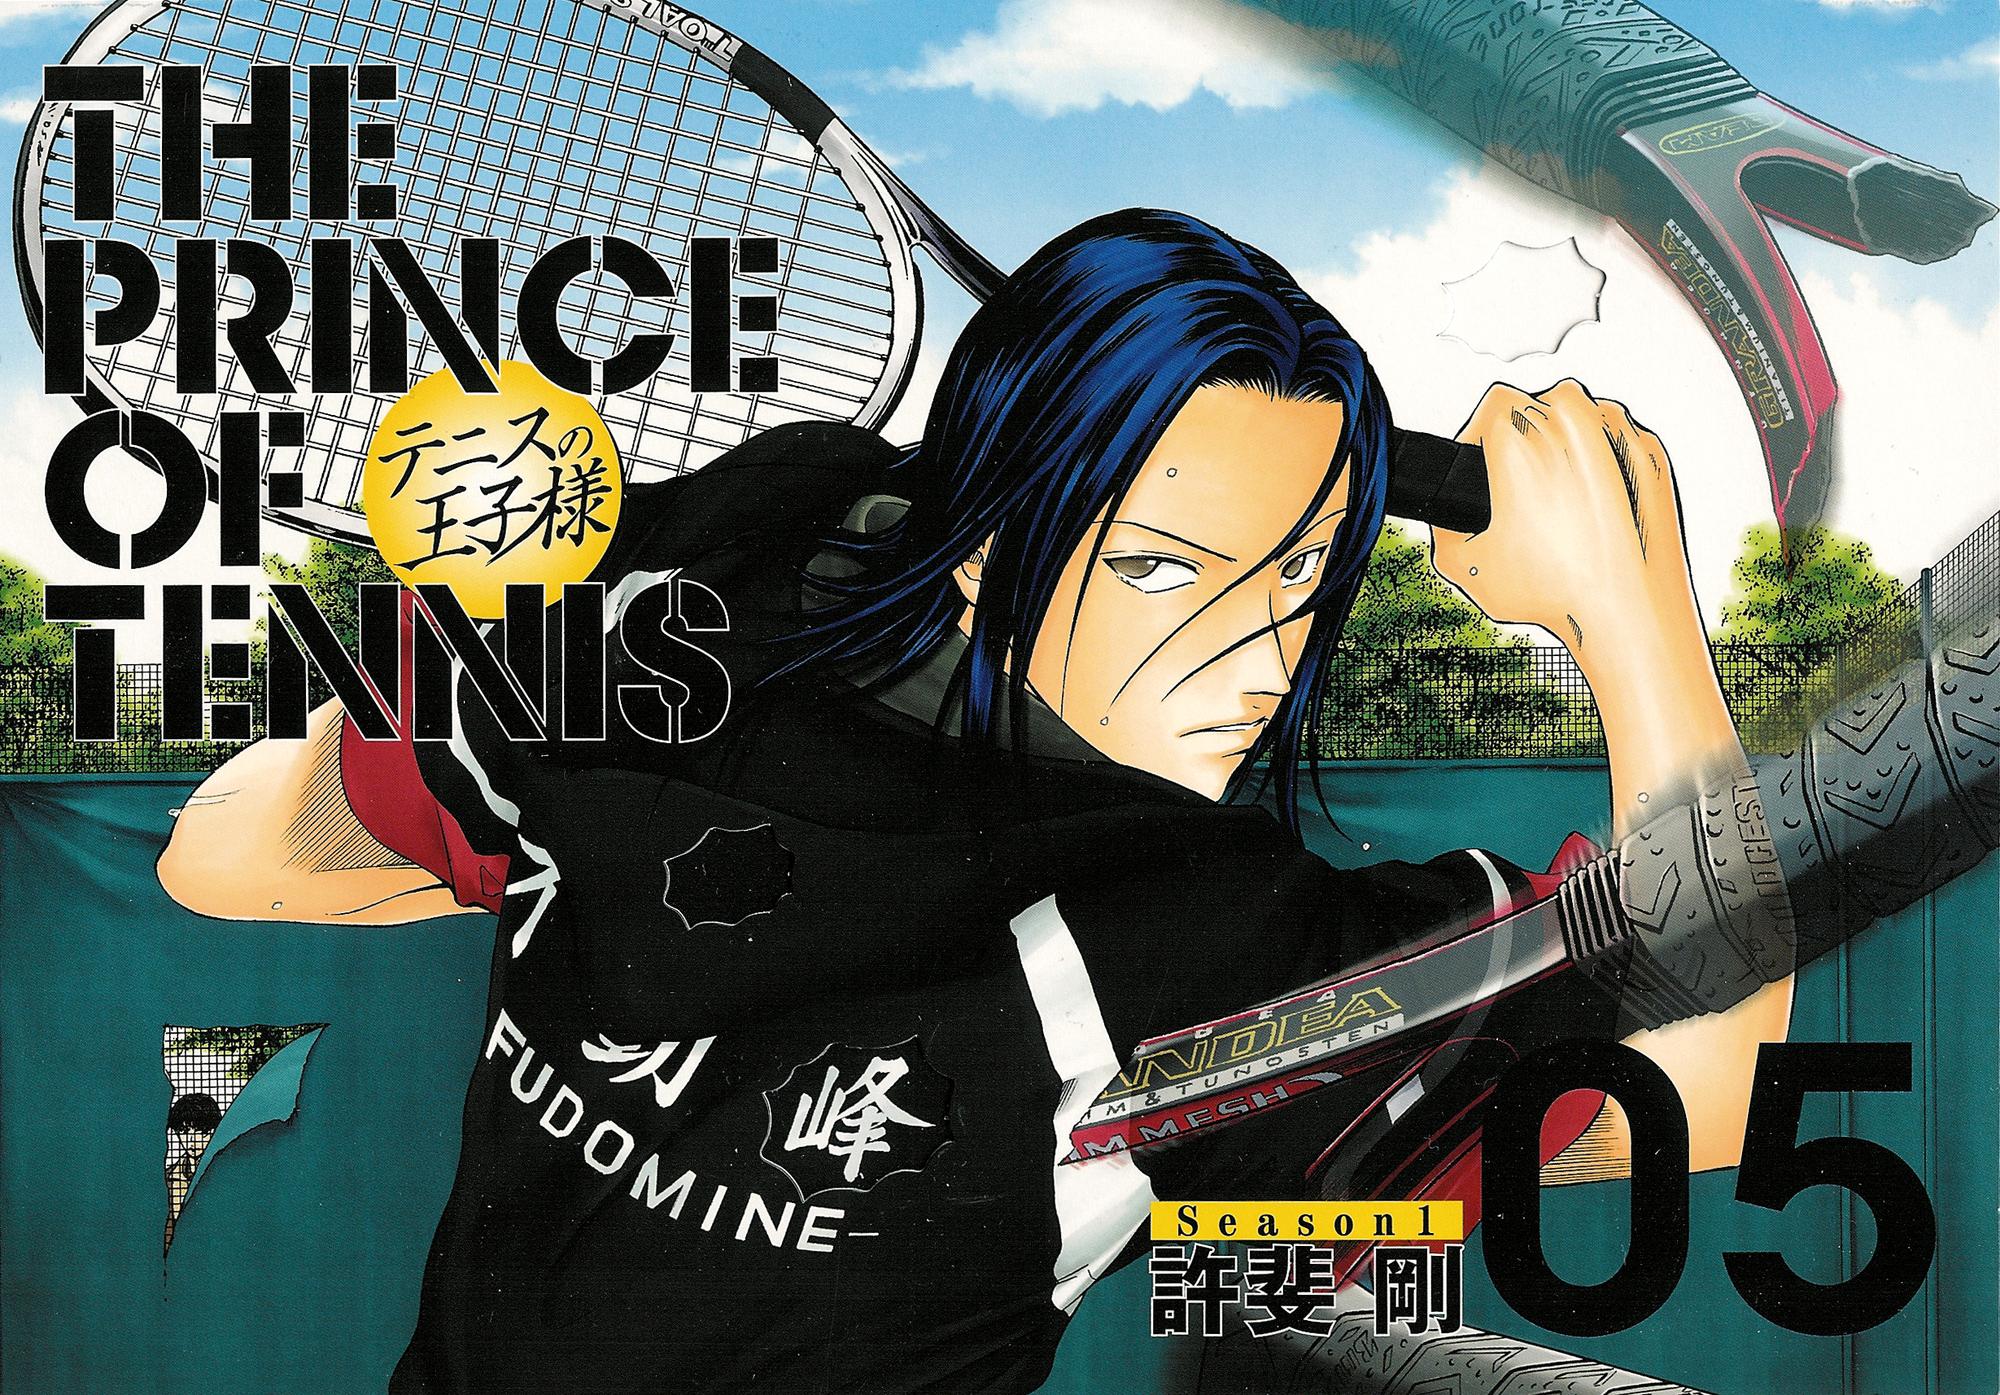 echizen.mine.nu Perfect Edition Season 1 Volume 5 | Prince of Tennis Wikia | Fandom powered  by Wikia